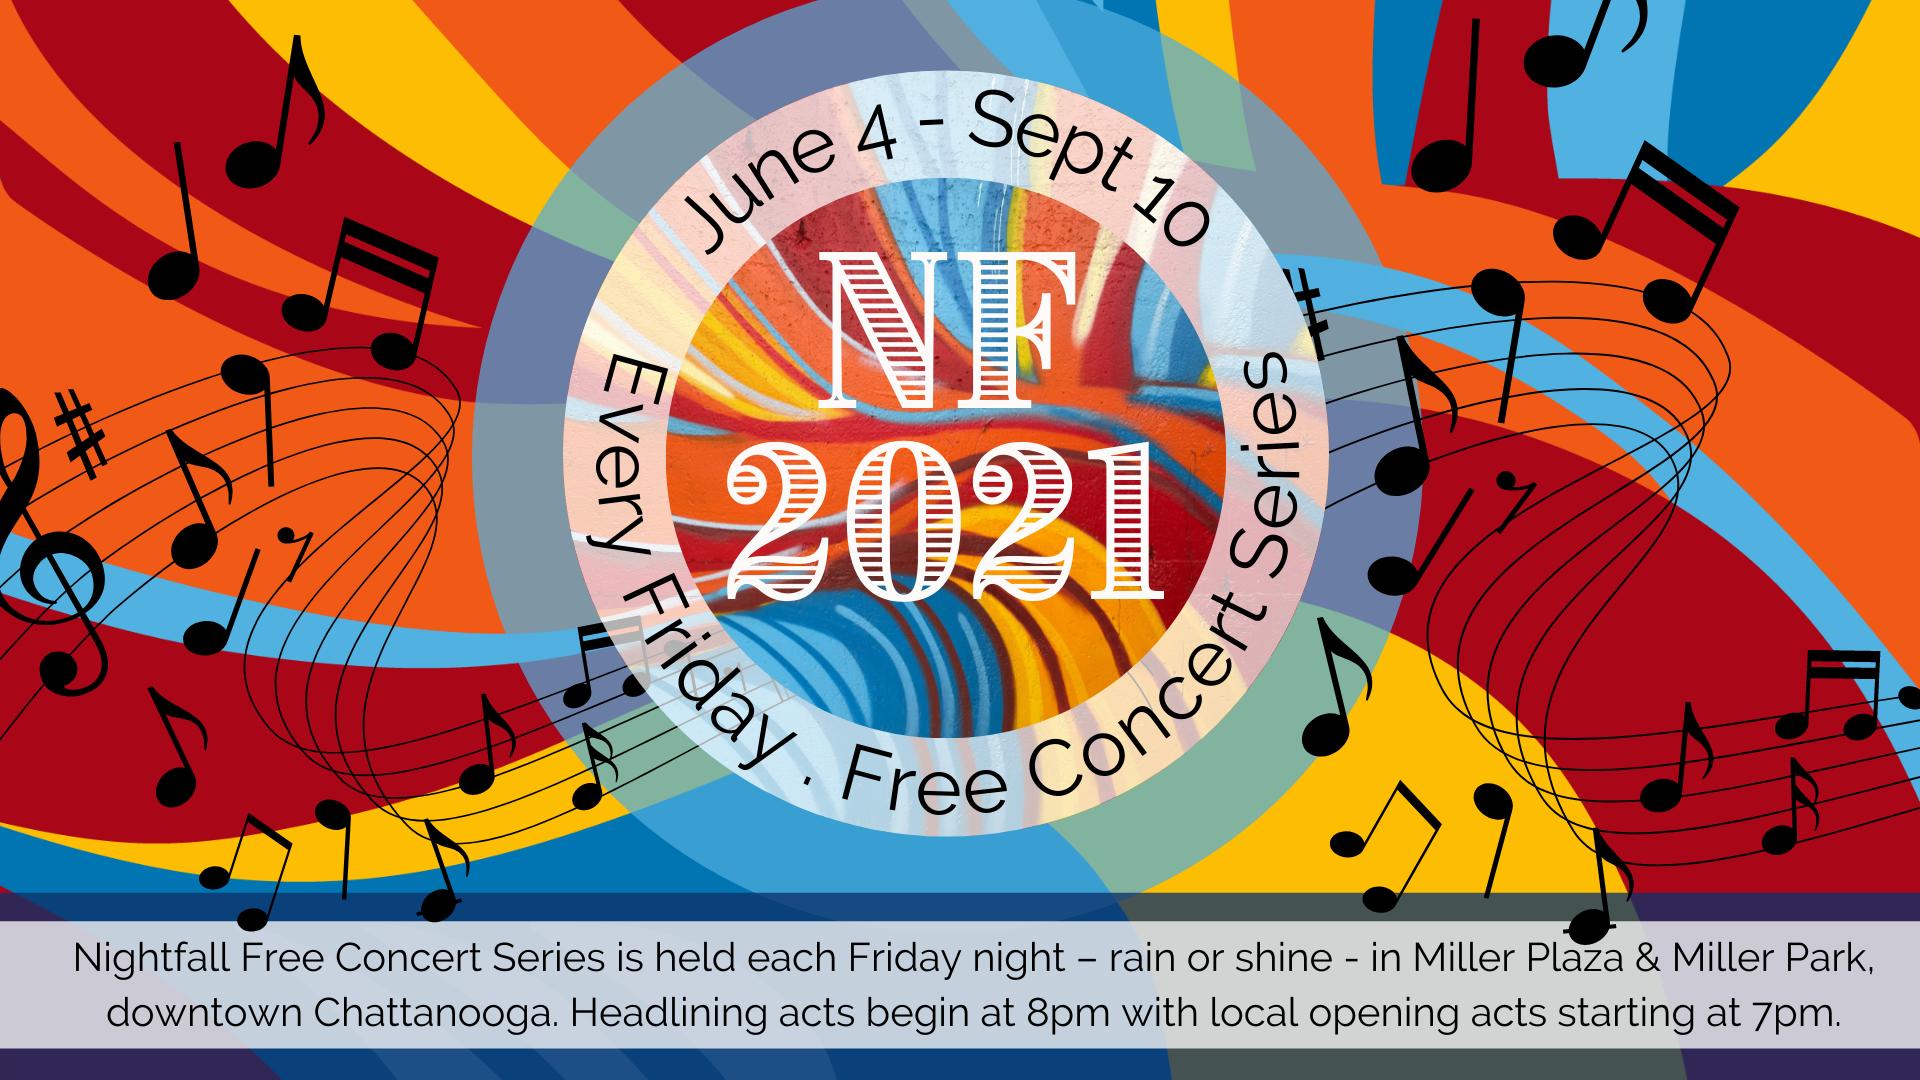 Nightfall Free Concert Series